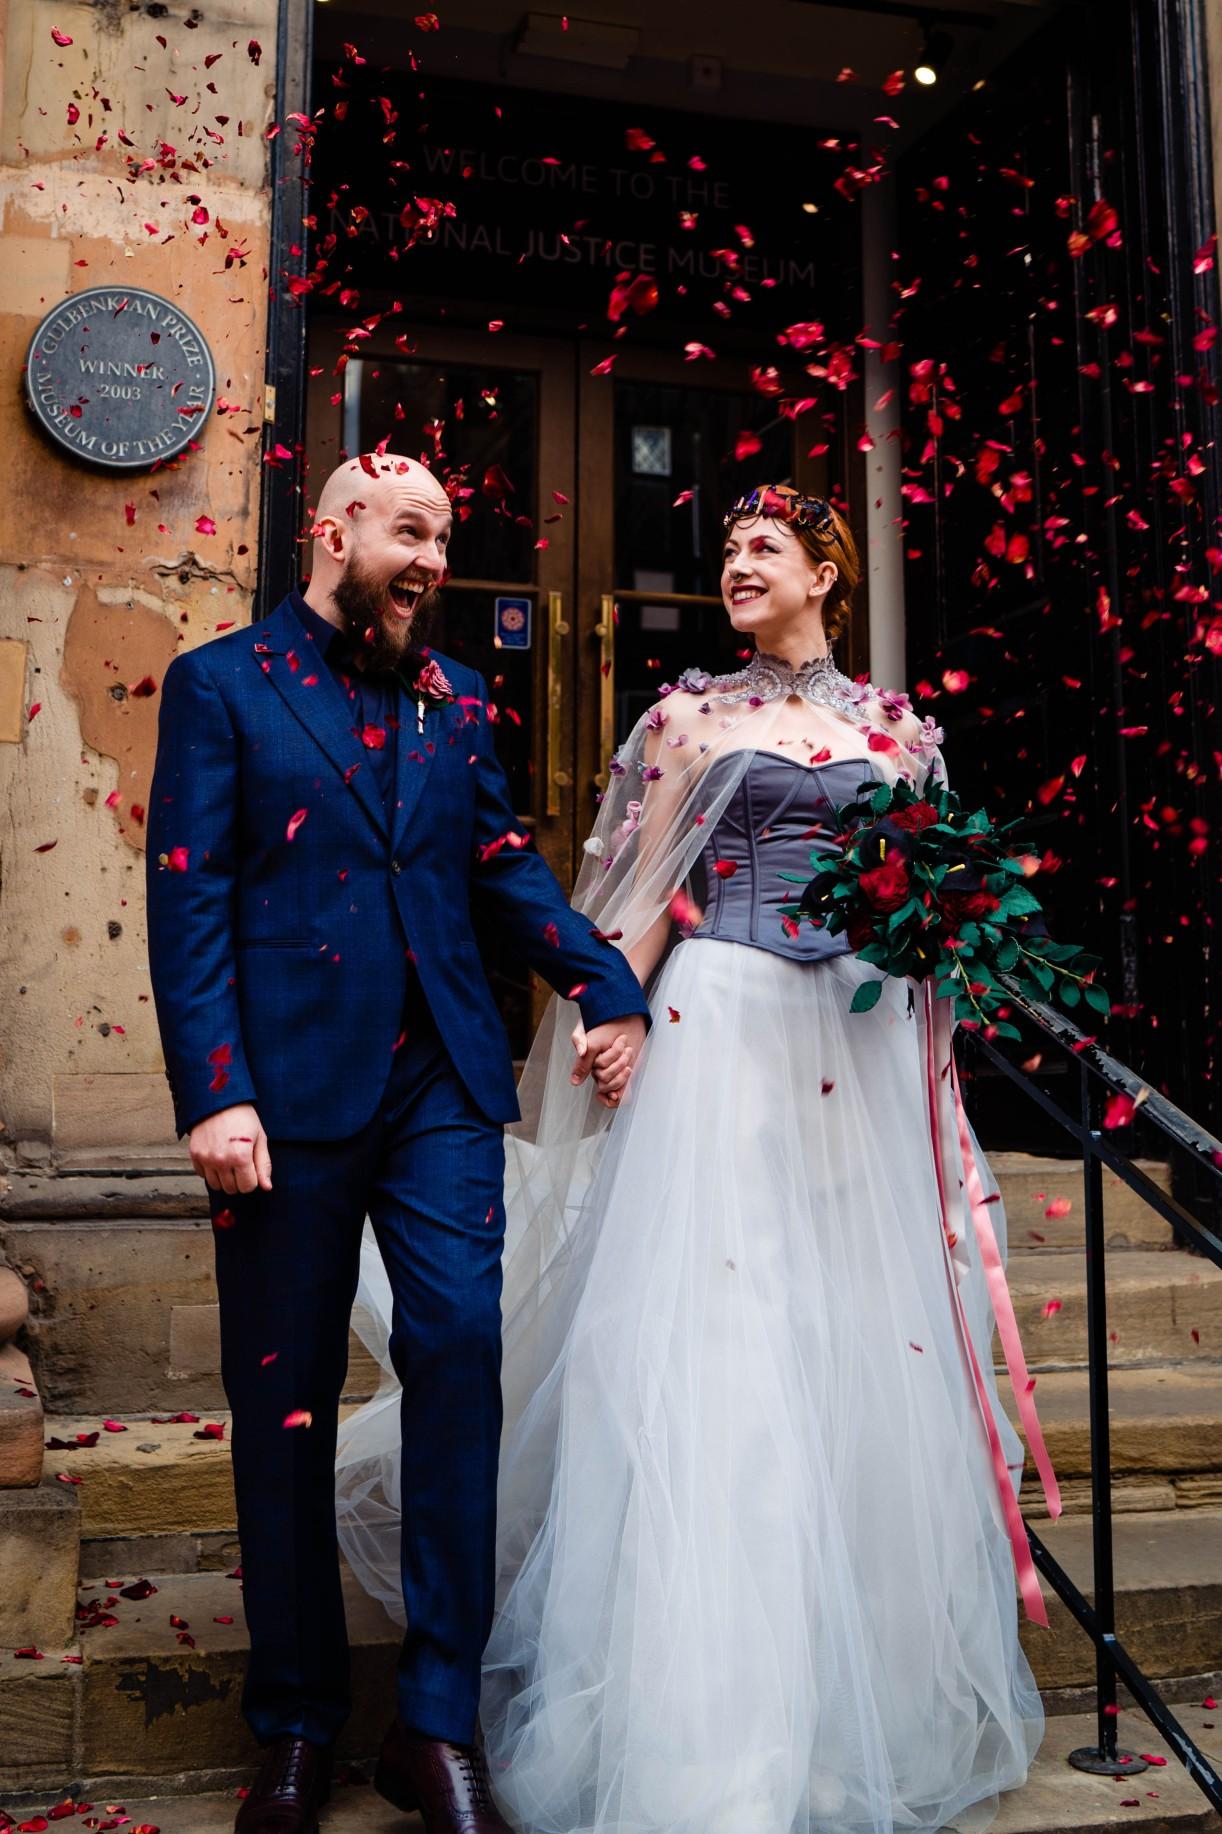 A gothic wedding - national justice museum wedding - alternative wedding - Vicki Clayson Photography (31)